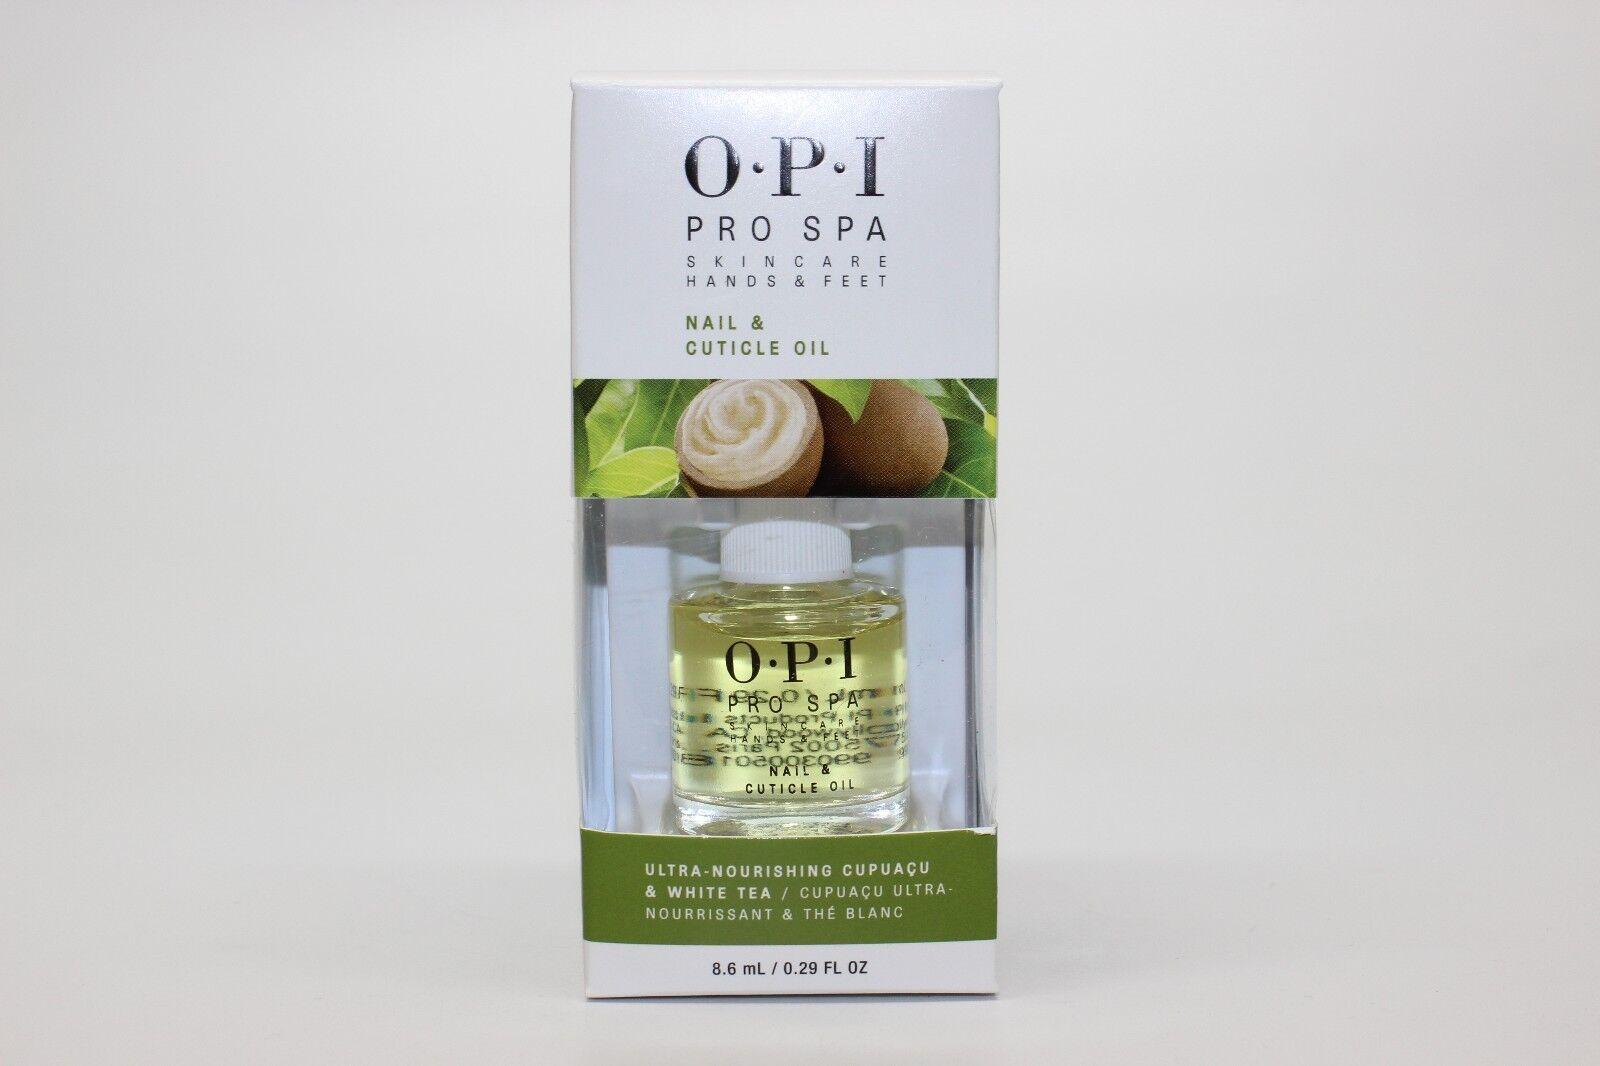 OPI Pro Spa Nail and Cuticle Oil 0.29oz | eBay